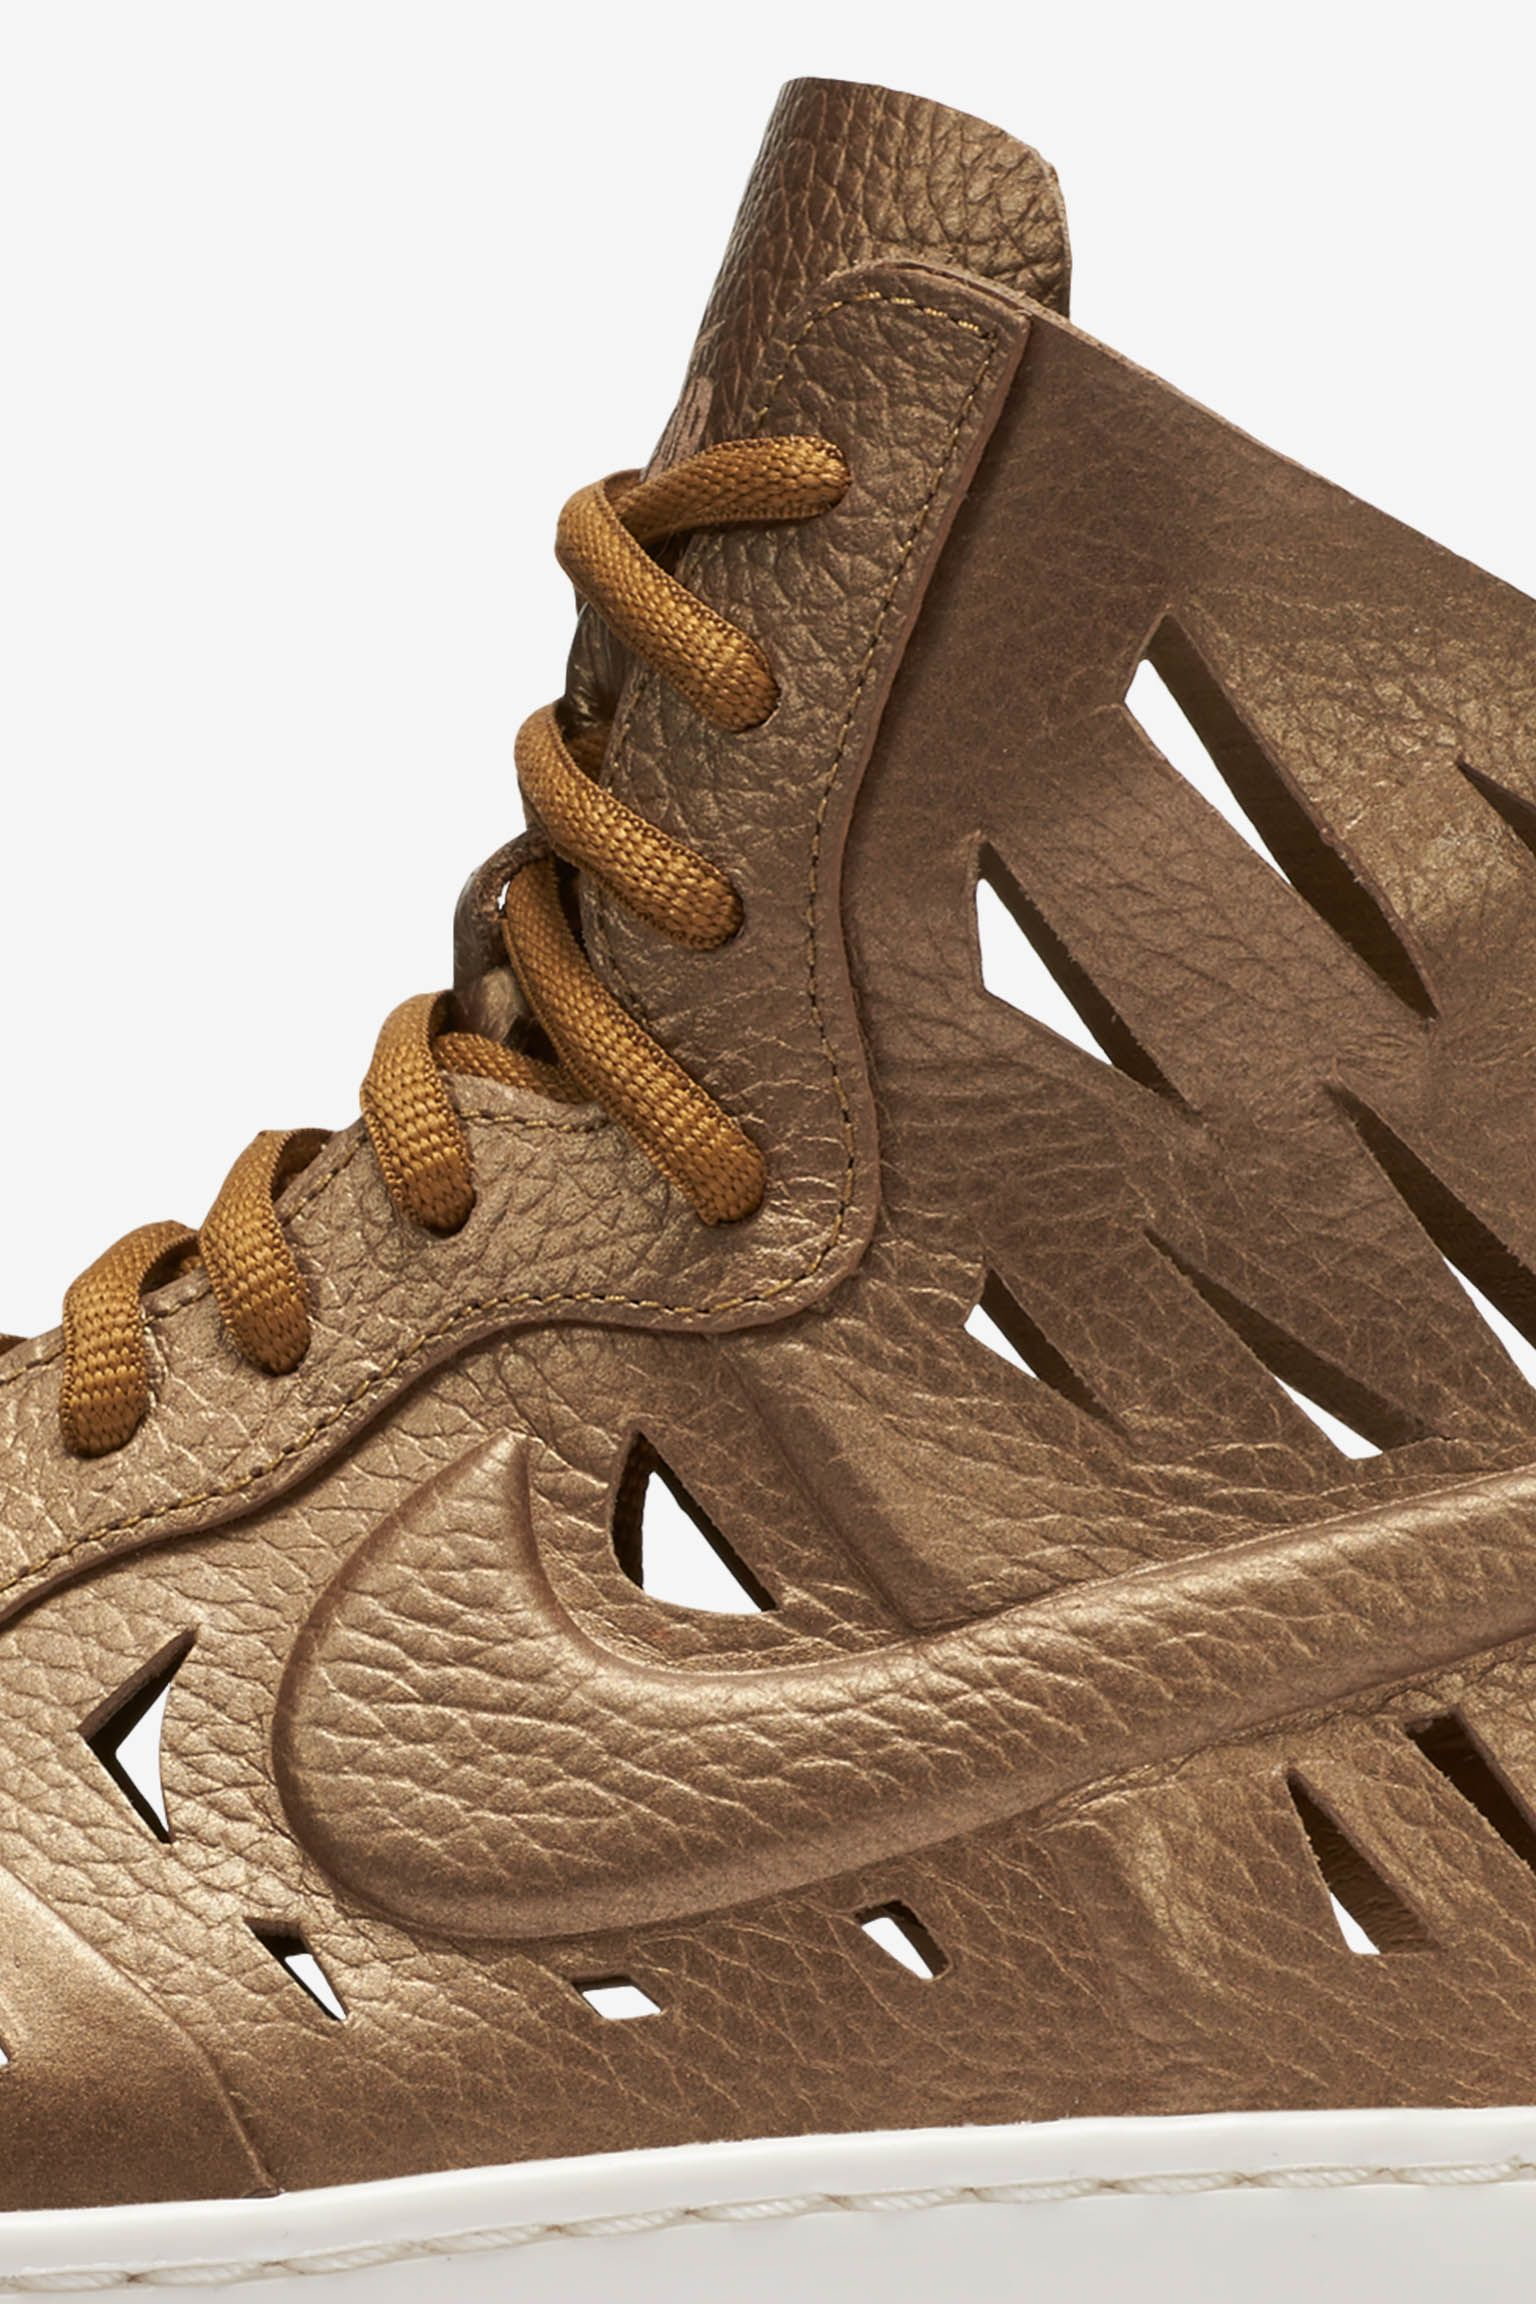 Women's Nike Air Force 1 Ultra Mid Joli 'Metallic Golden Tan' Release Date